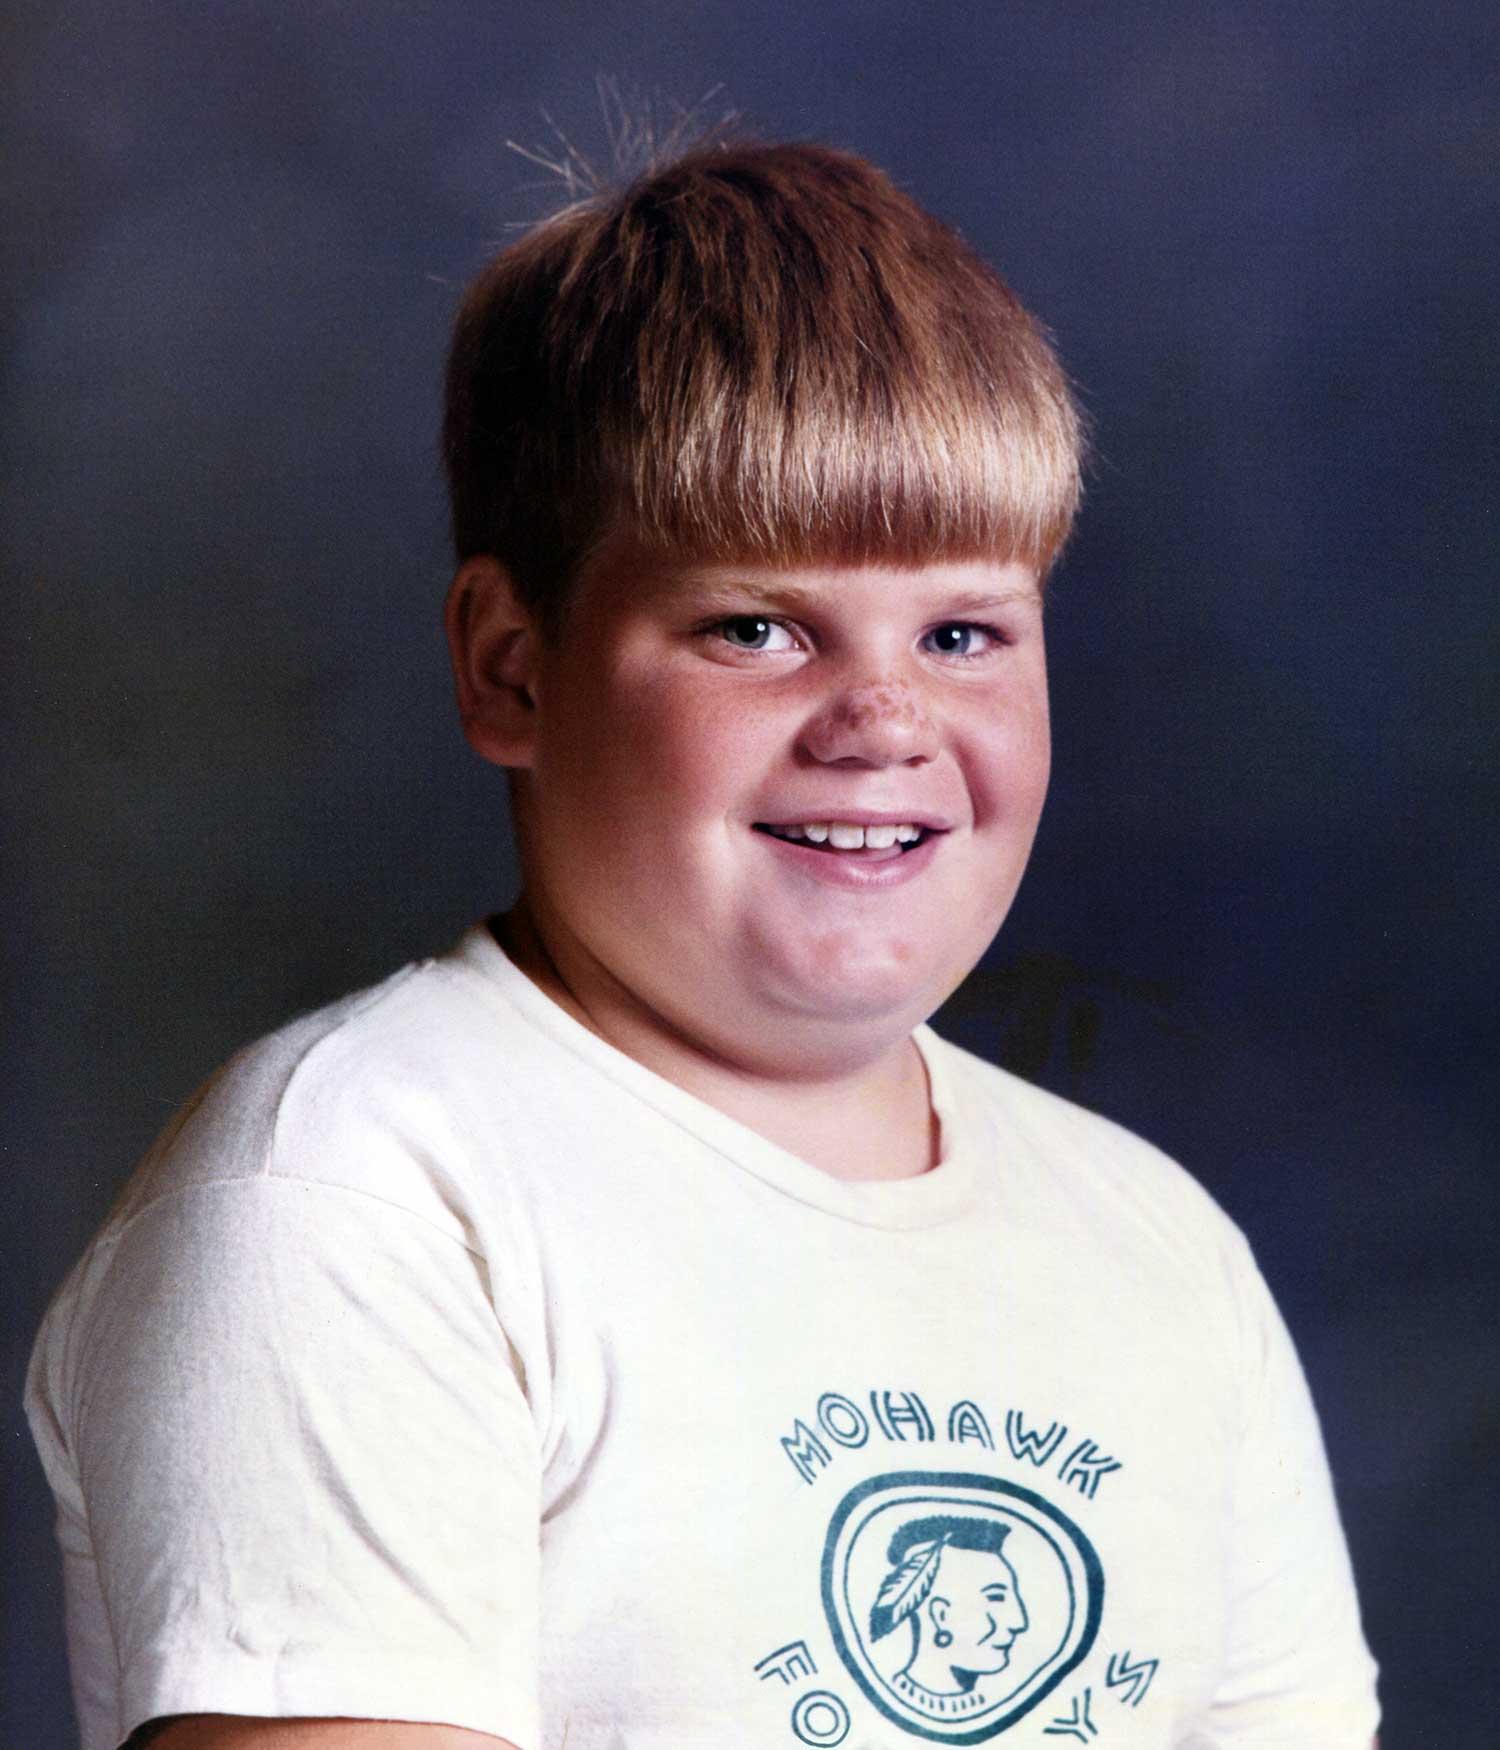 Chris Farley boyhood